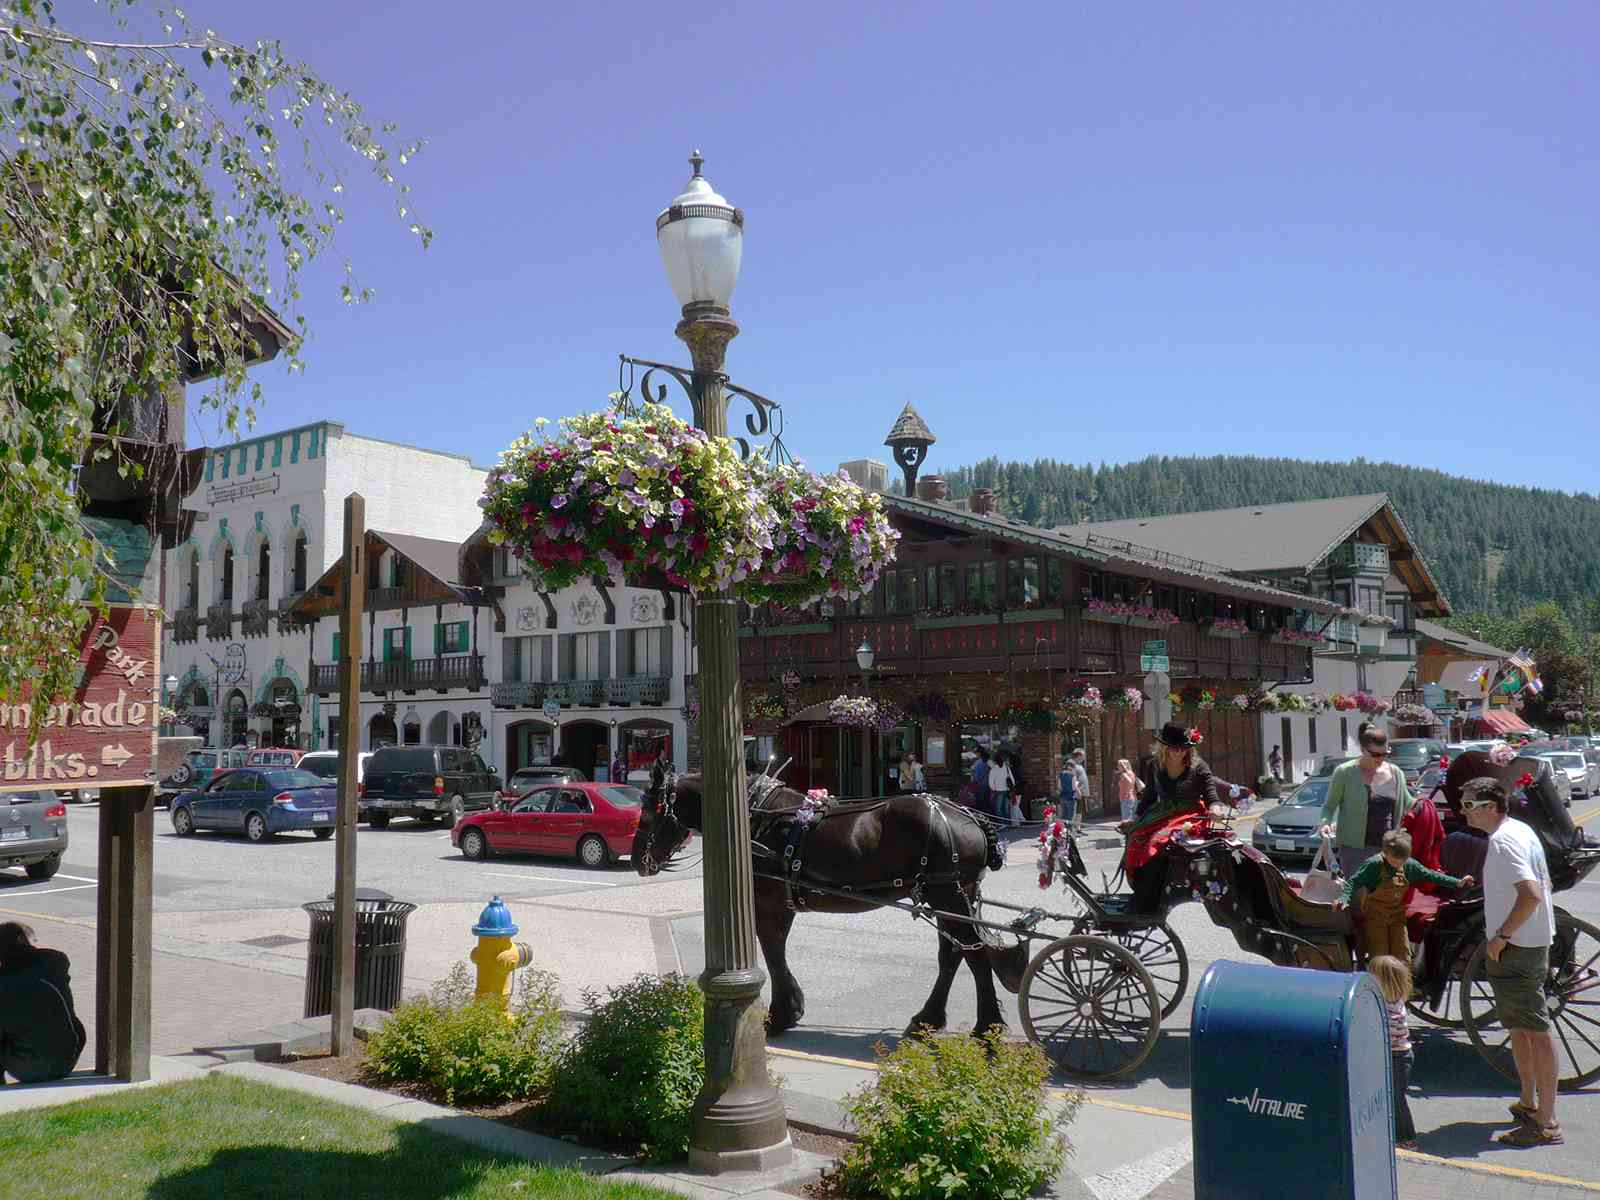 Leavenworth's Front Street